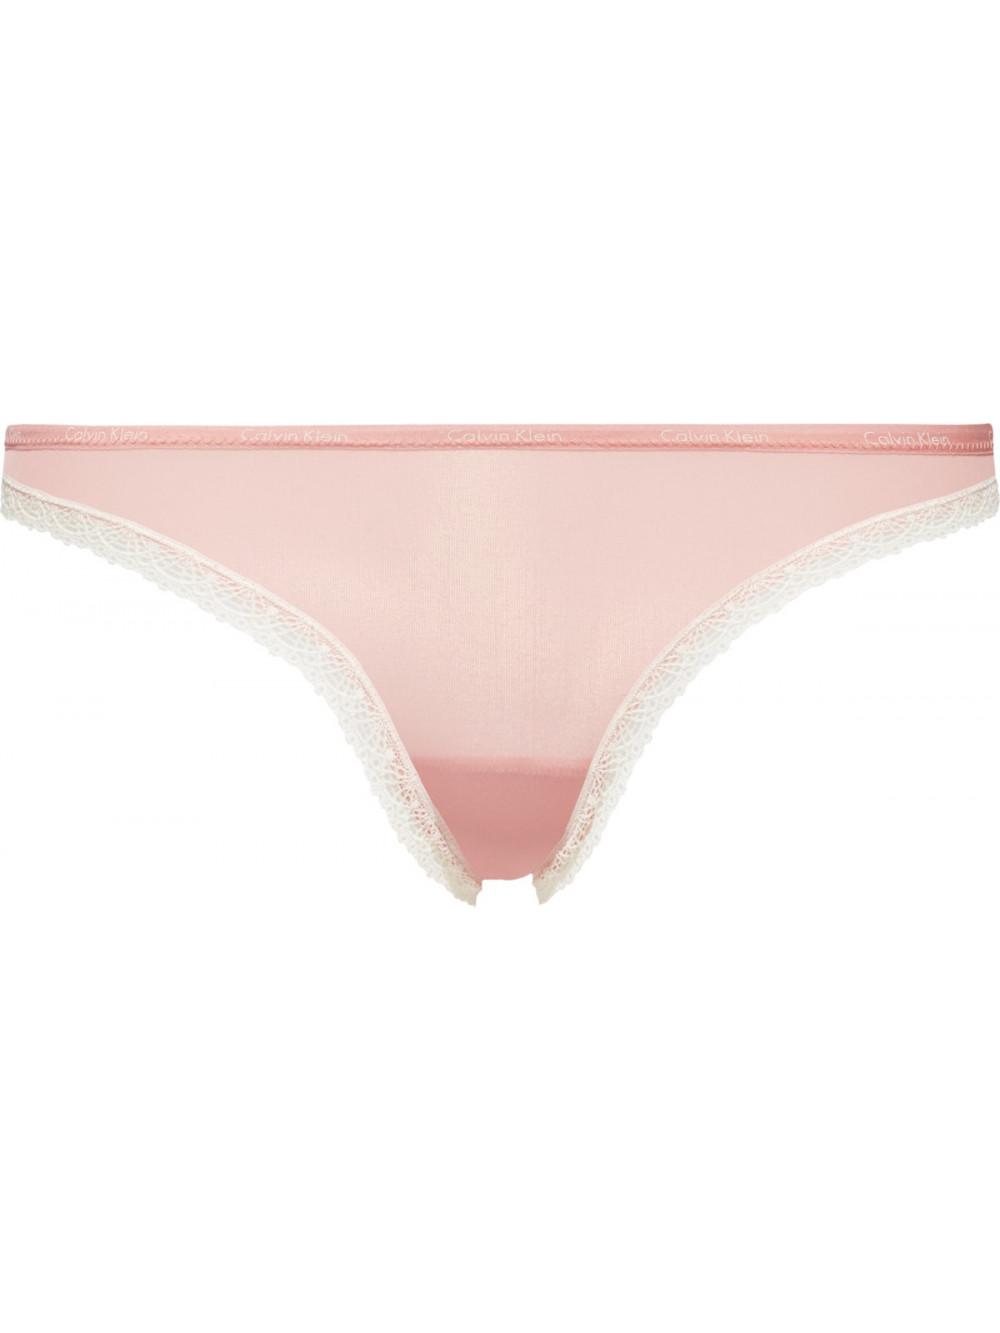 Dámske tangá Calvin Klein Bikini Bottoms Up Ružové